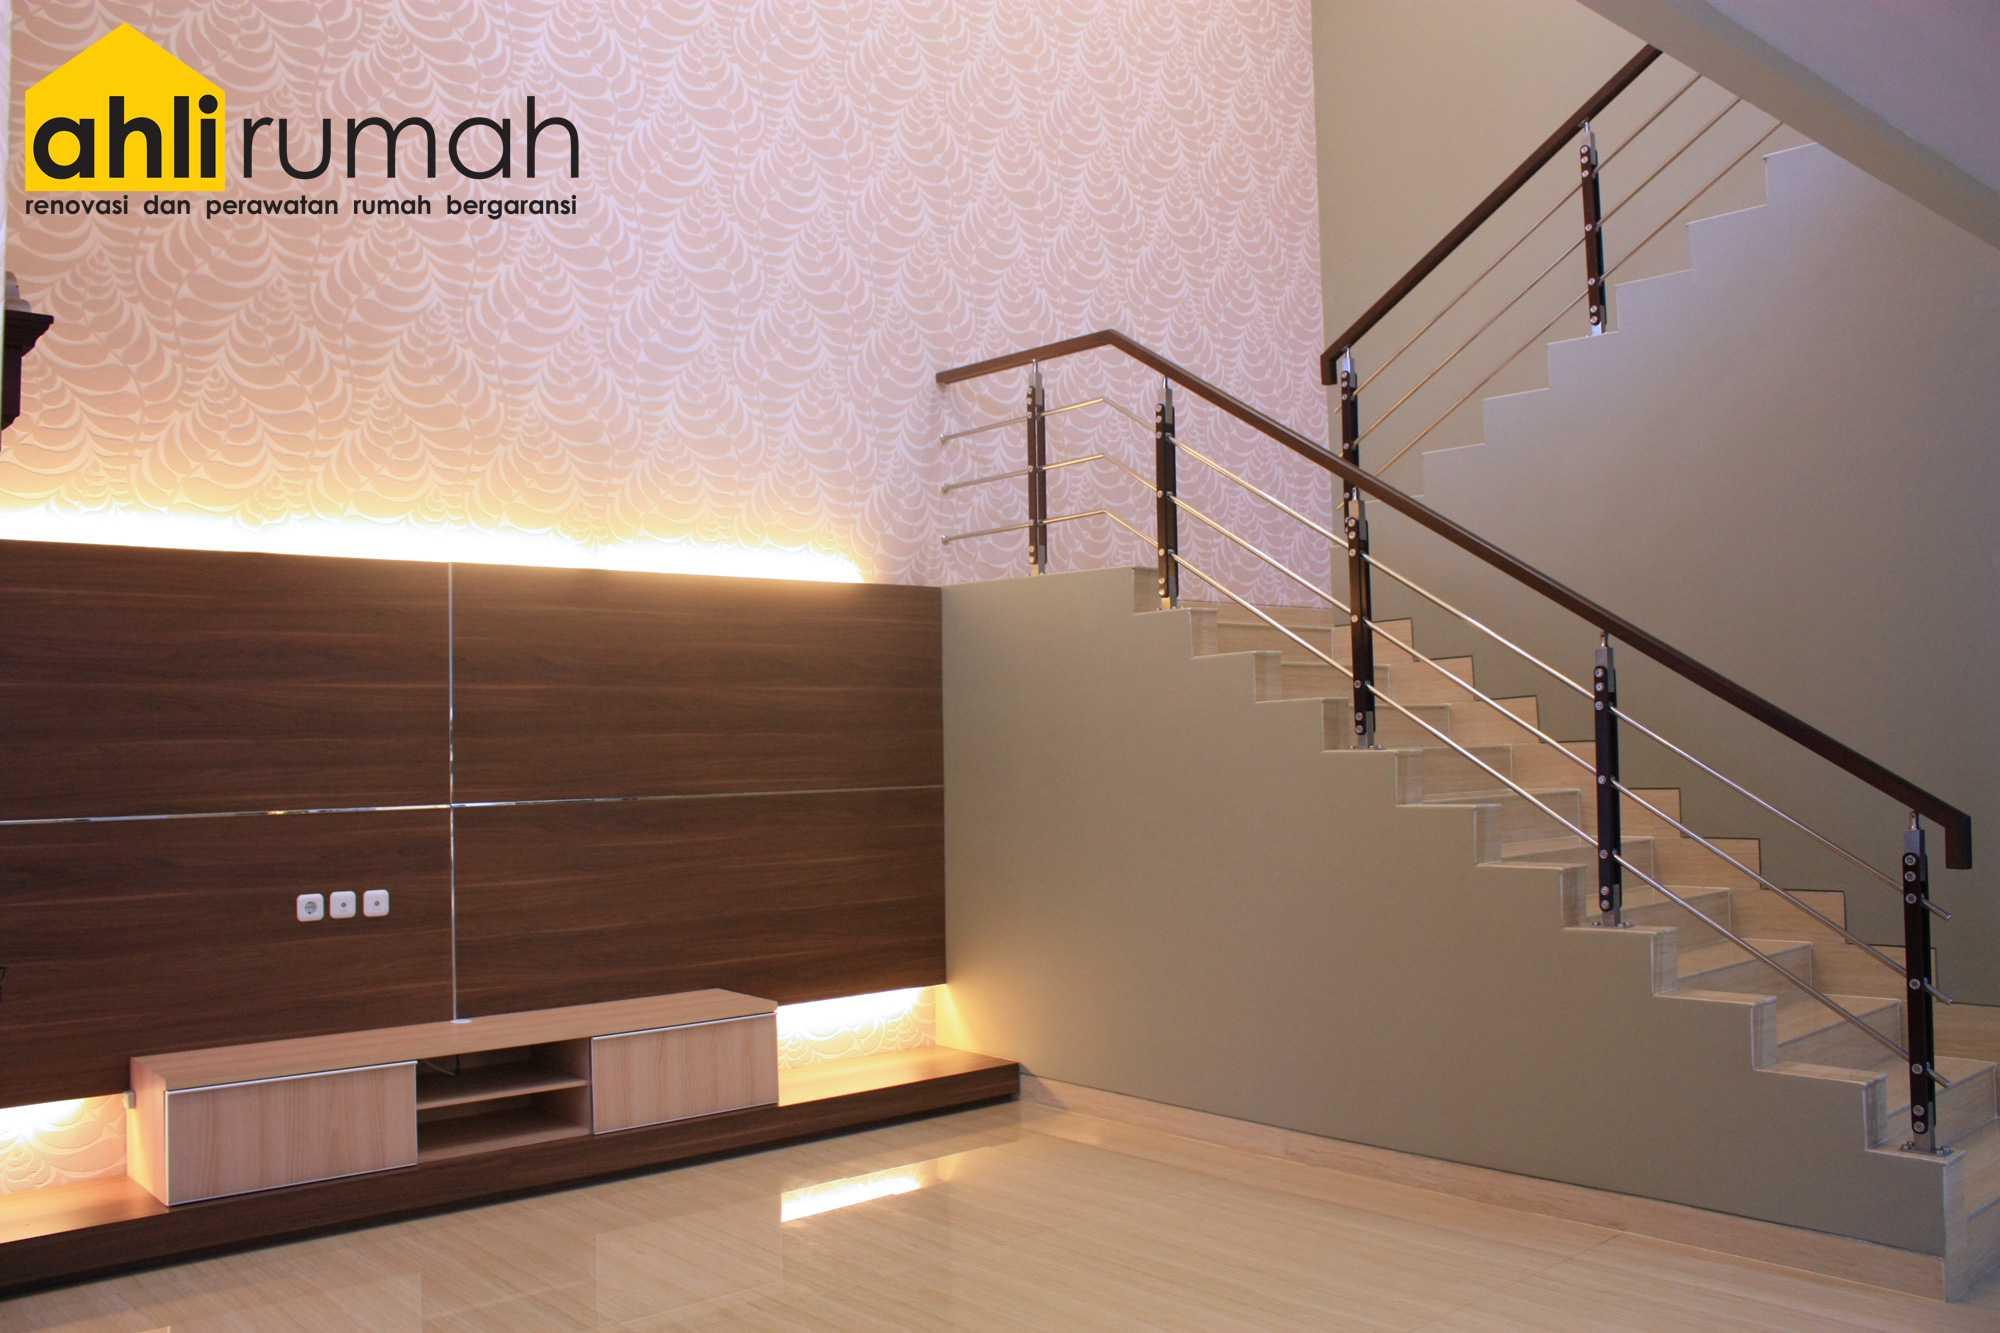 Ahlirumah.id Interior - Rumah Ibu C Daerah Khusus Ibukota Jakarta, Indonesia  Staircase View Kontemporer  49167